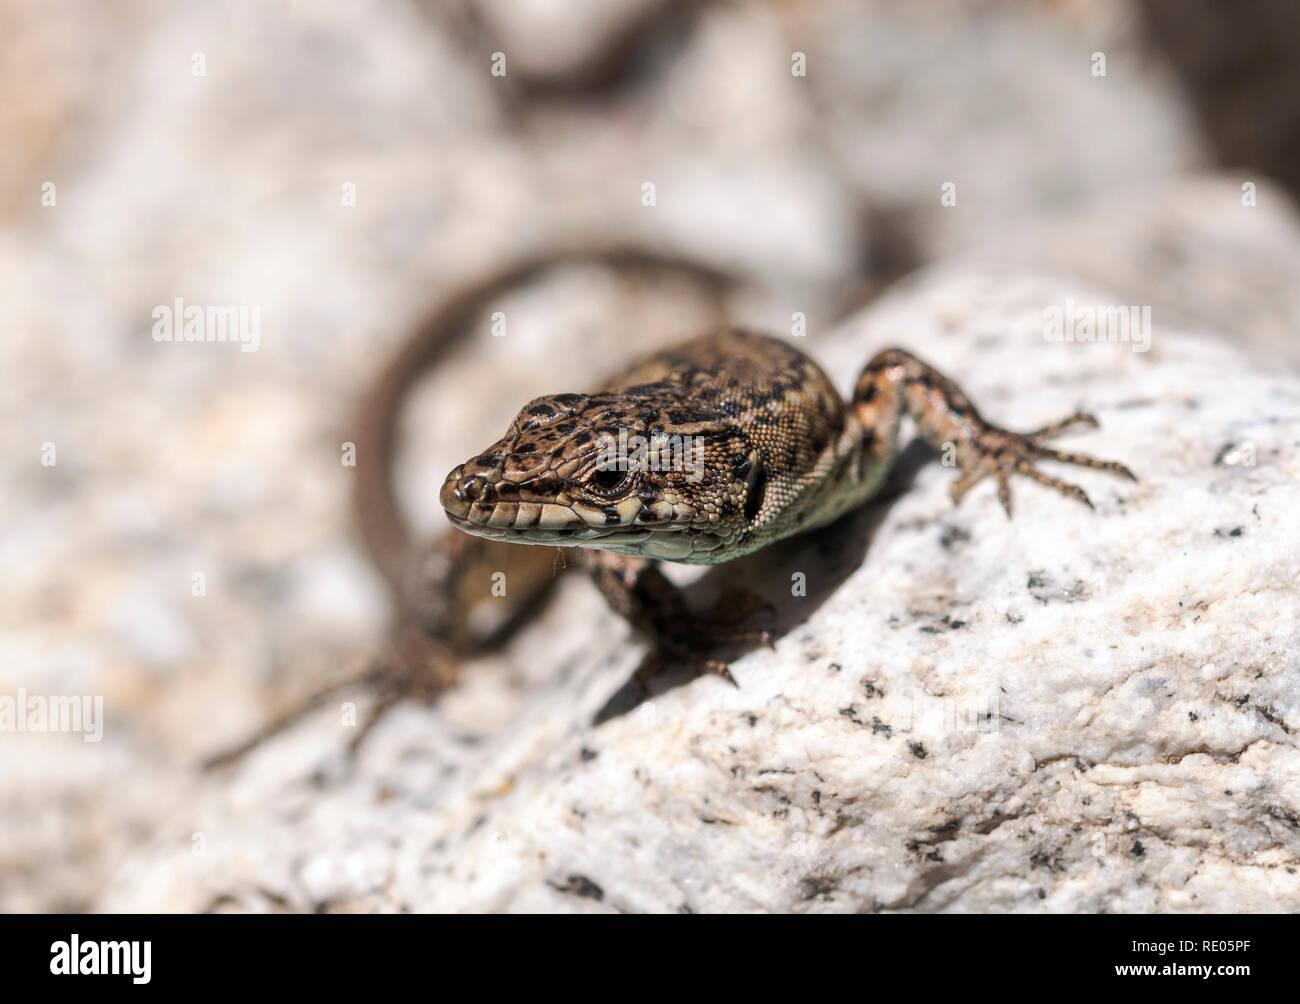 Iberian wall lizard, Podarcis hispanica, on a rock. Photo taken next to the Minchones Stream, in the region of La Vera, Caceres, Extremadura, Spain Stock Photo